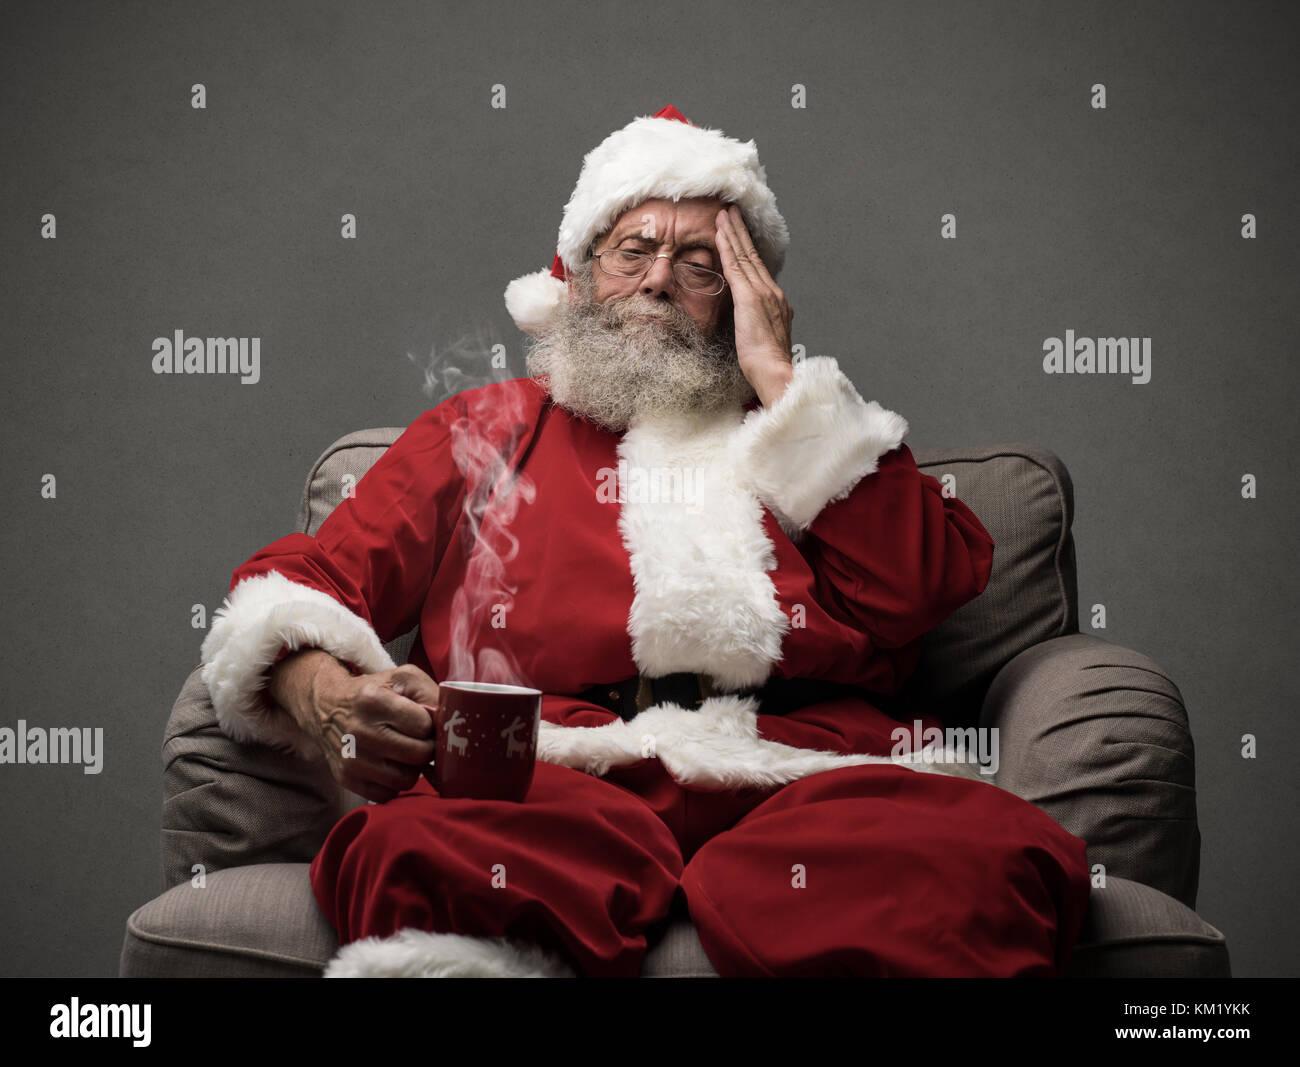 Sad Santa Claus having an headache on Chistmas Eve, stress and illness concept - Stock Image